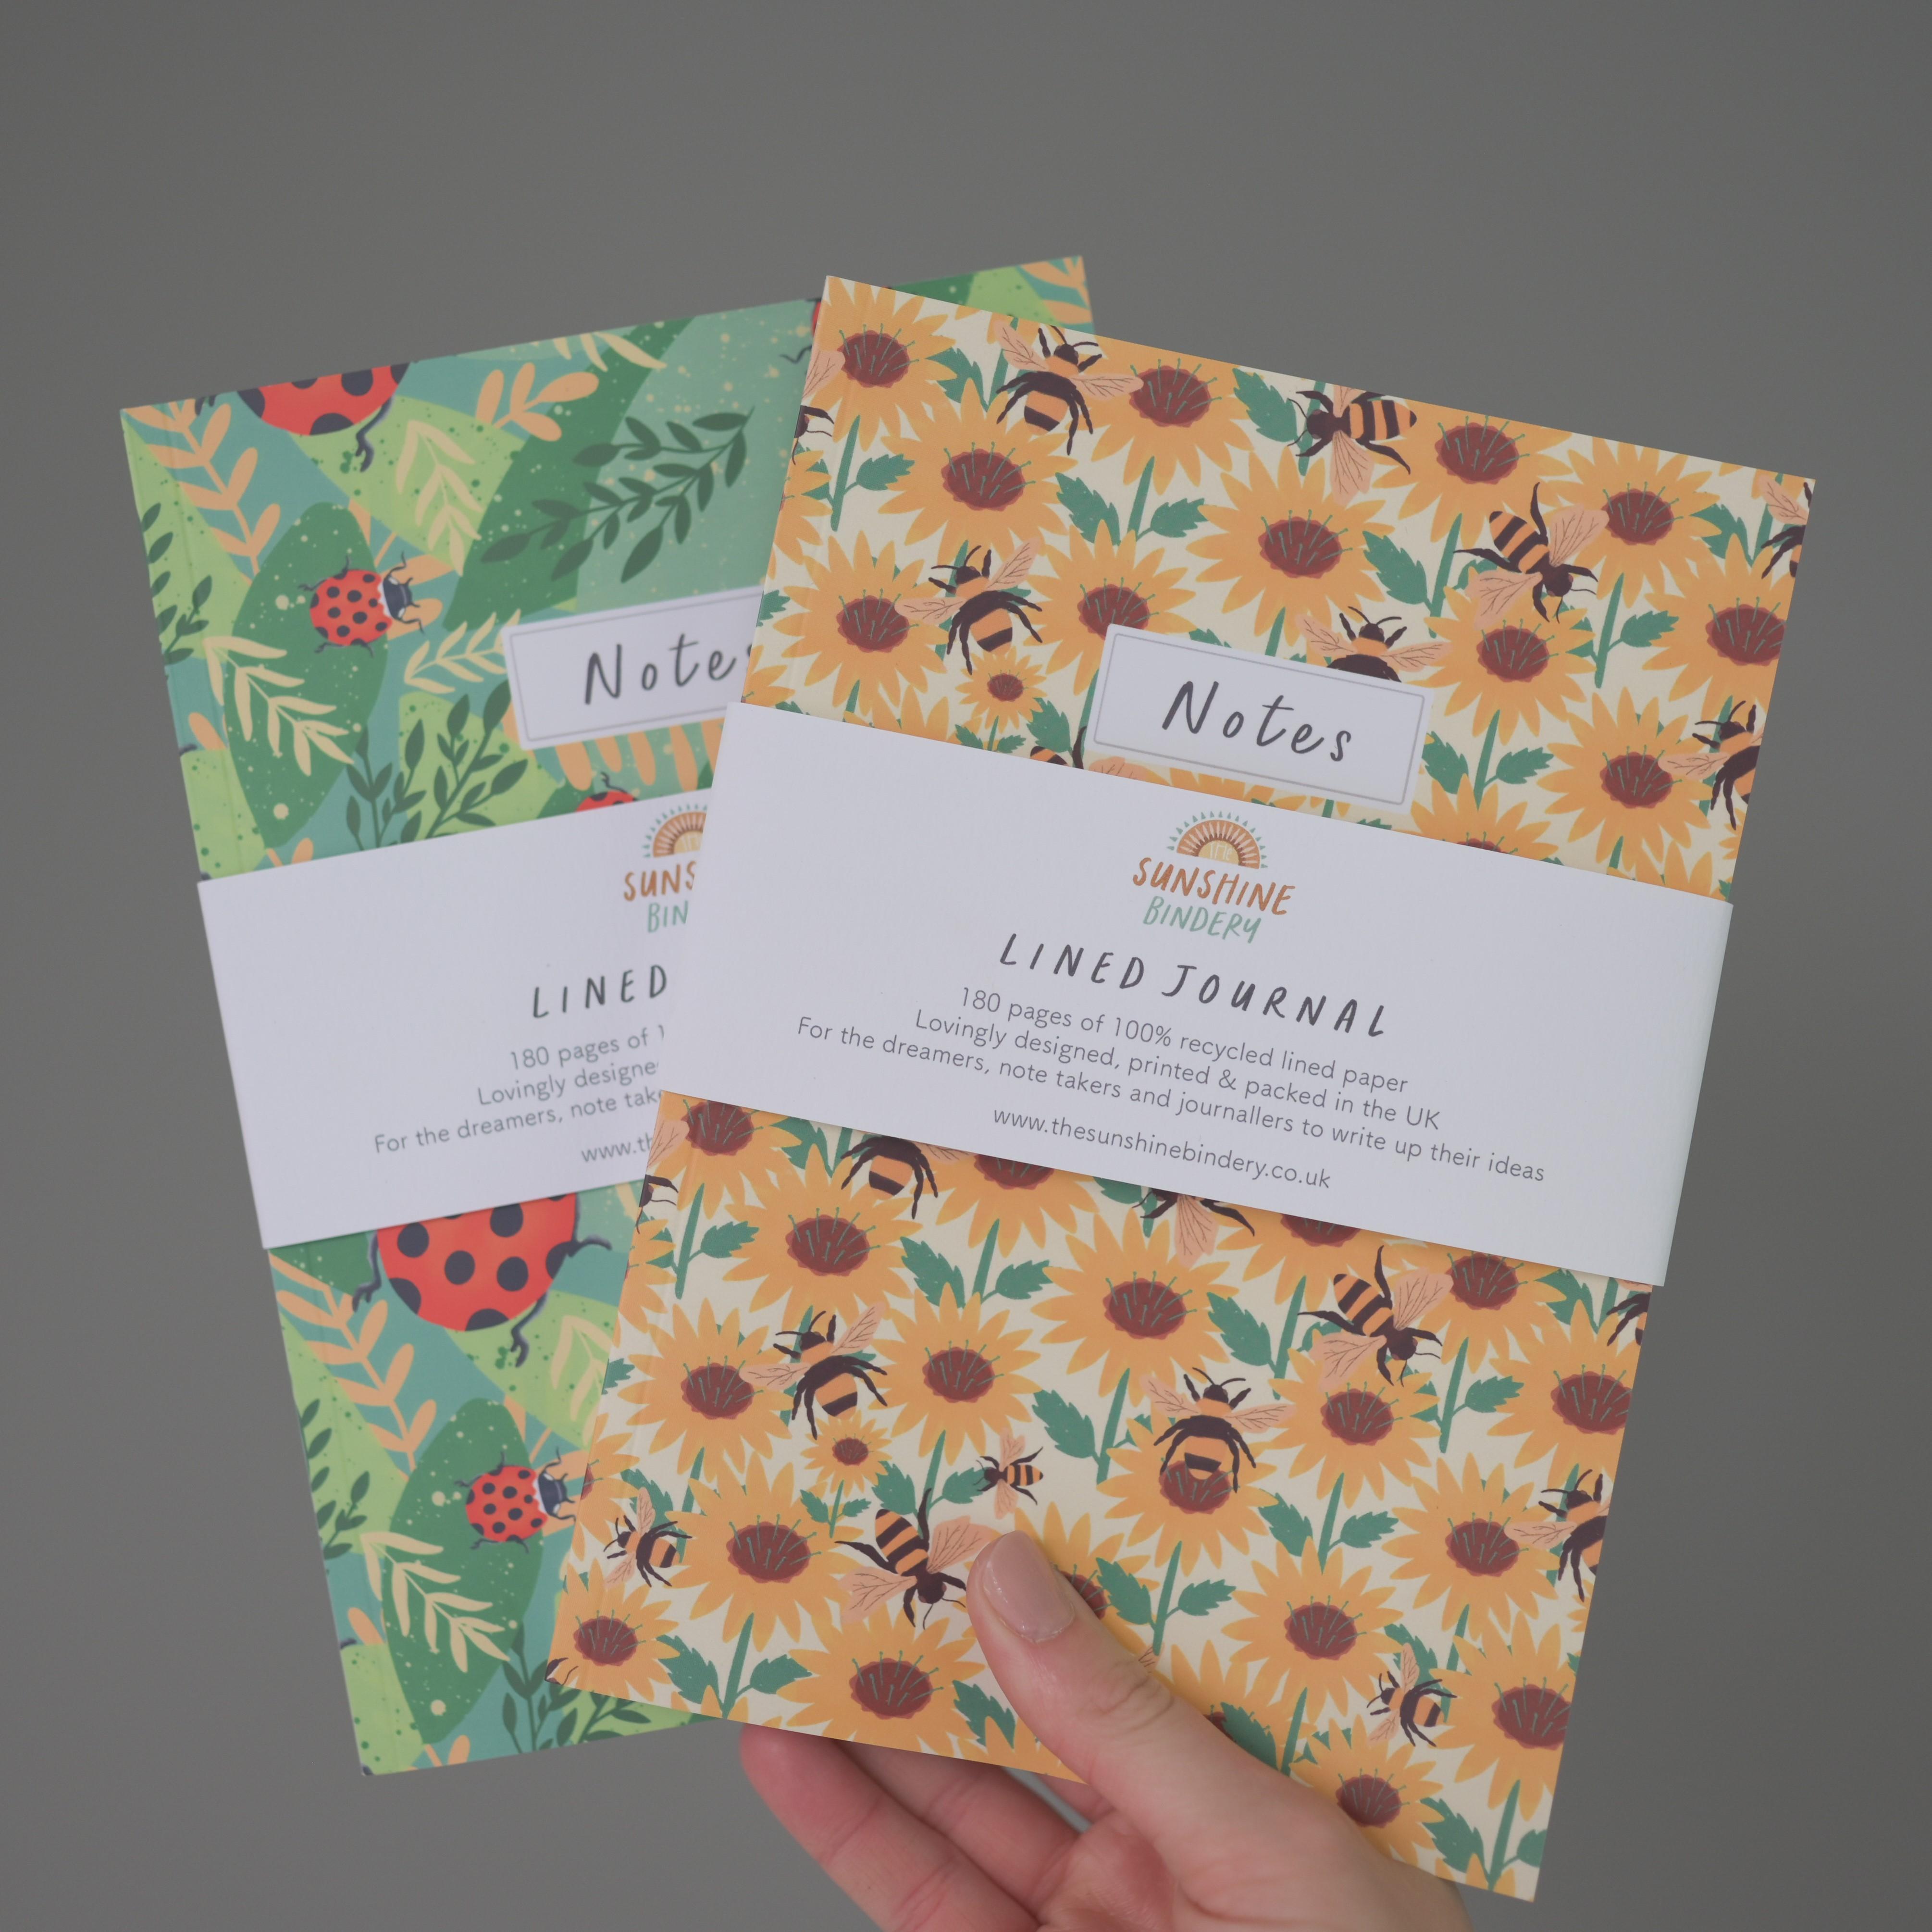 Journal, The Sunshine Bindery